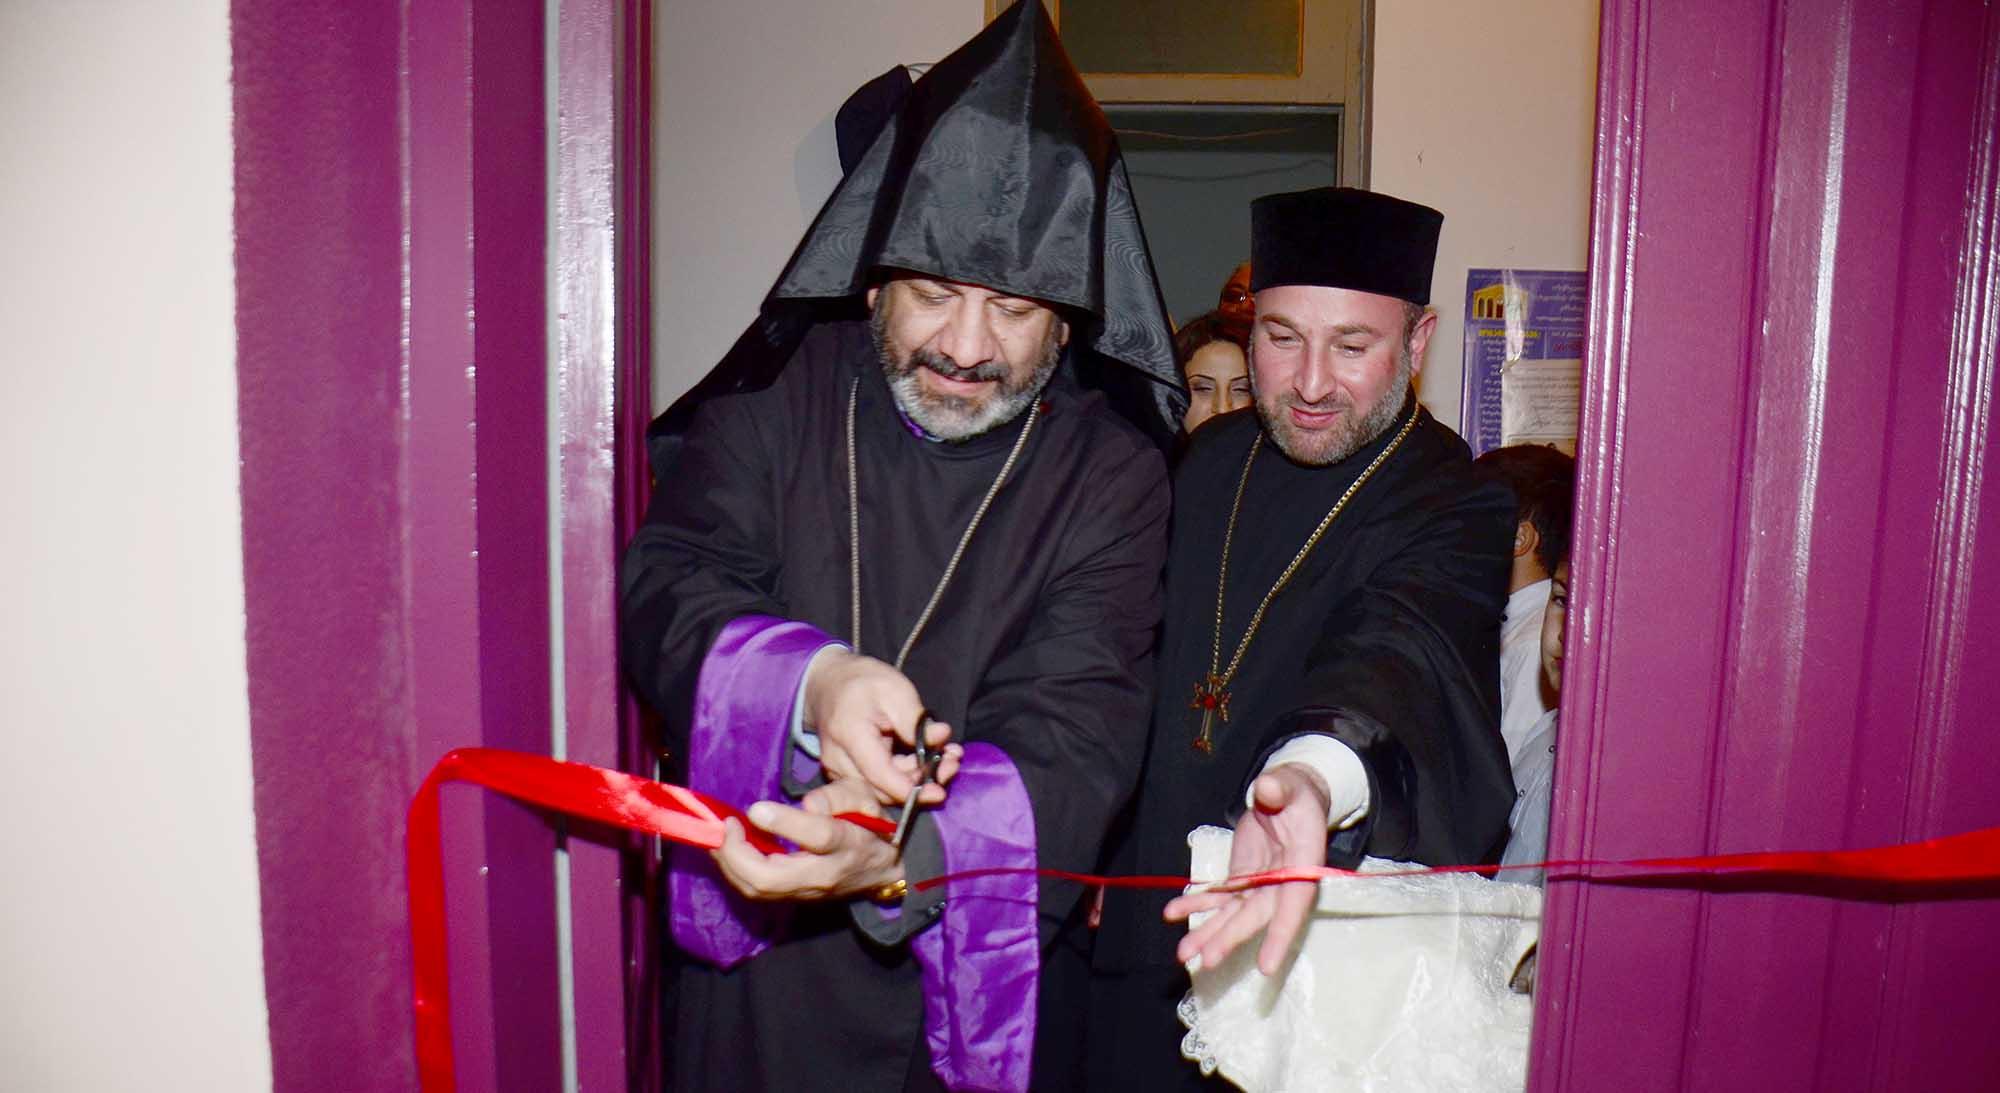 Photo of Վրաստանի Օզուրգեթի քաղաքում բացվեց Կոմիտաս վարդապետի անվան կենտրոն